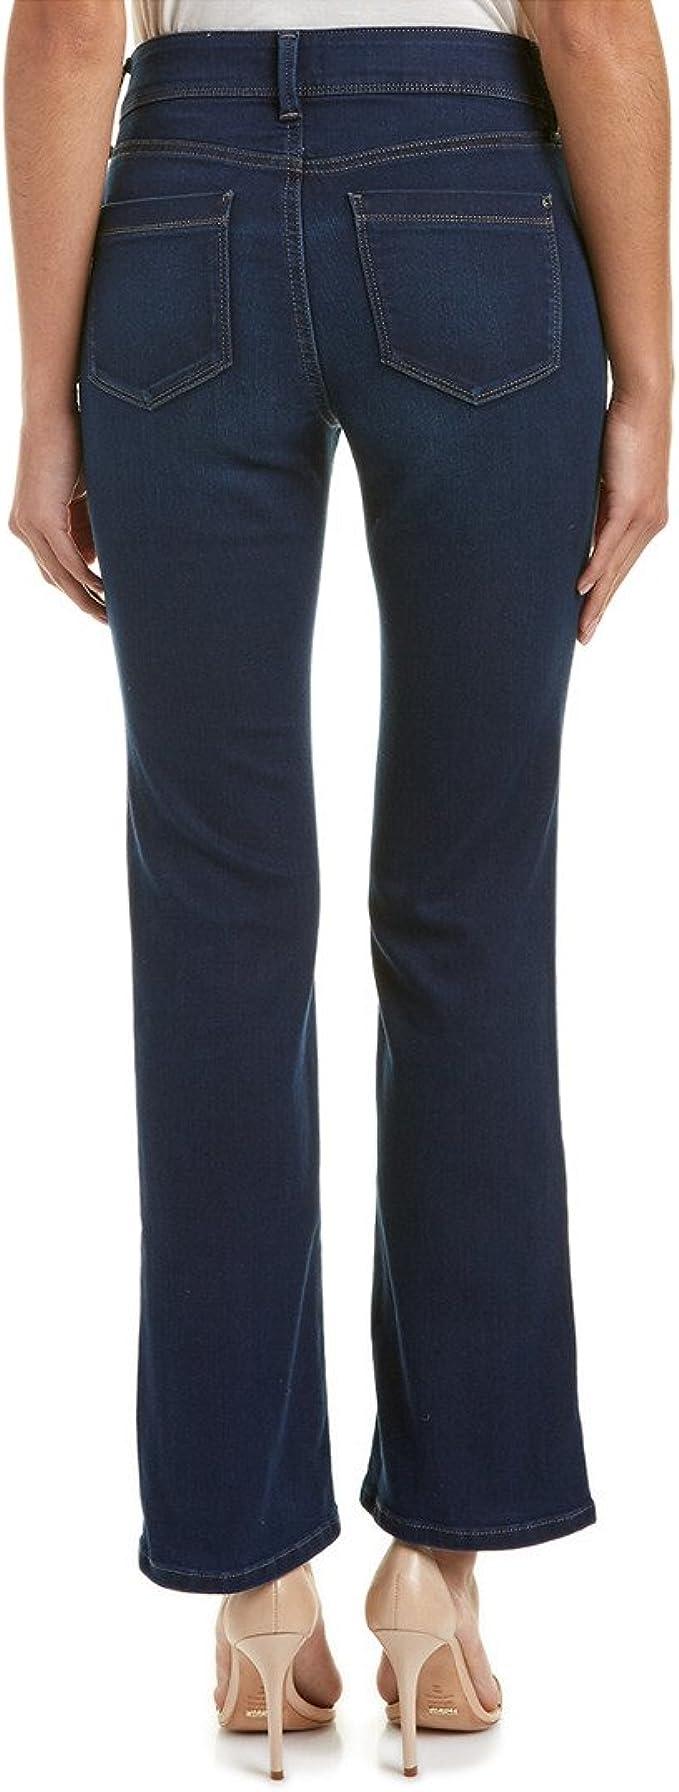 NYDJ Womens Petite Barbara Jeans Bootcut Pants